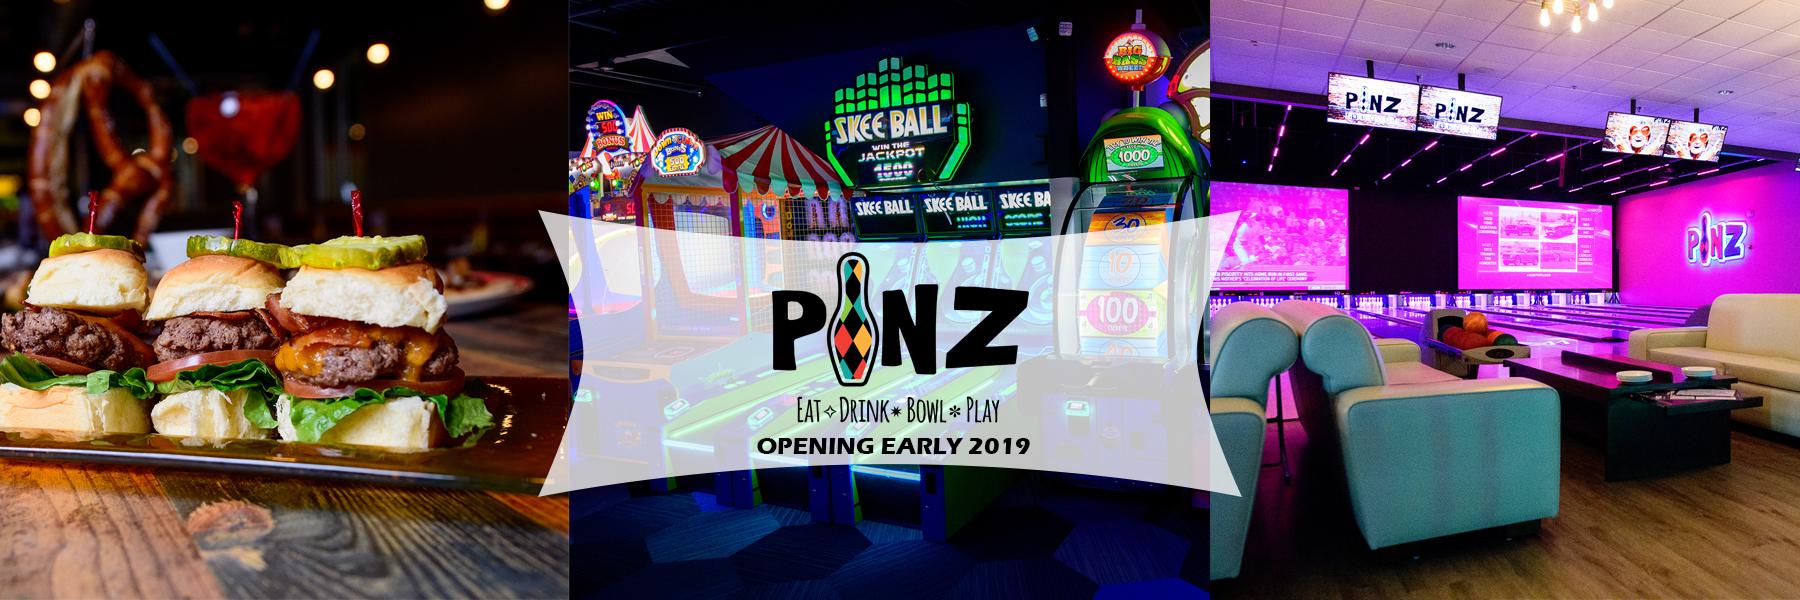 PiNZ Opening 2019